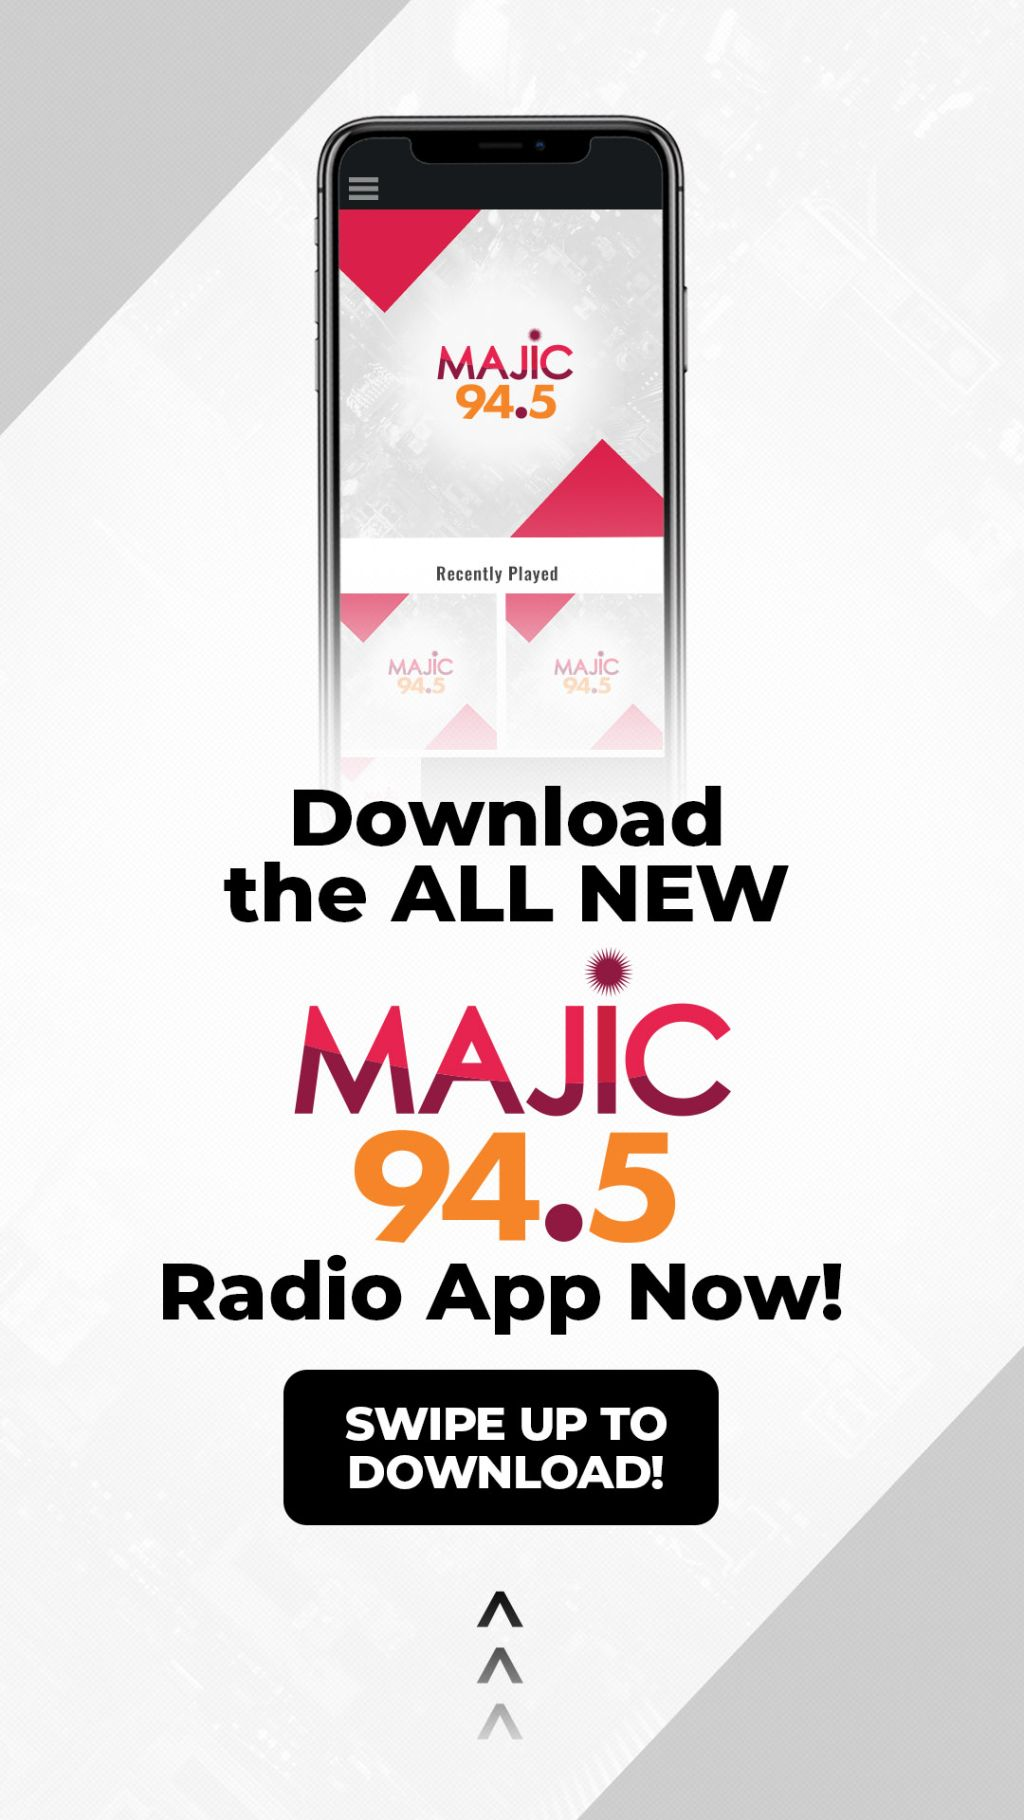 Majic 94.5 App Banners